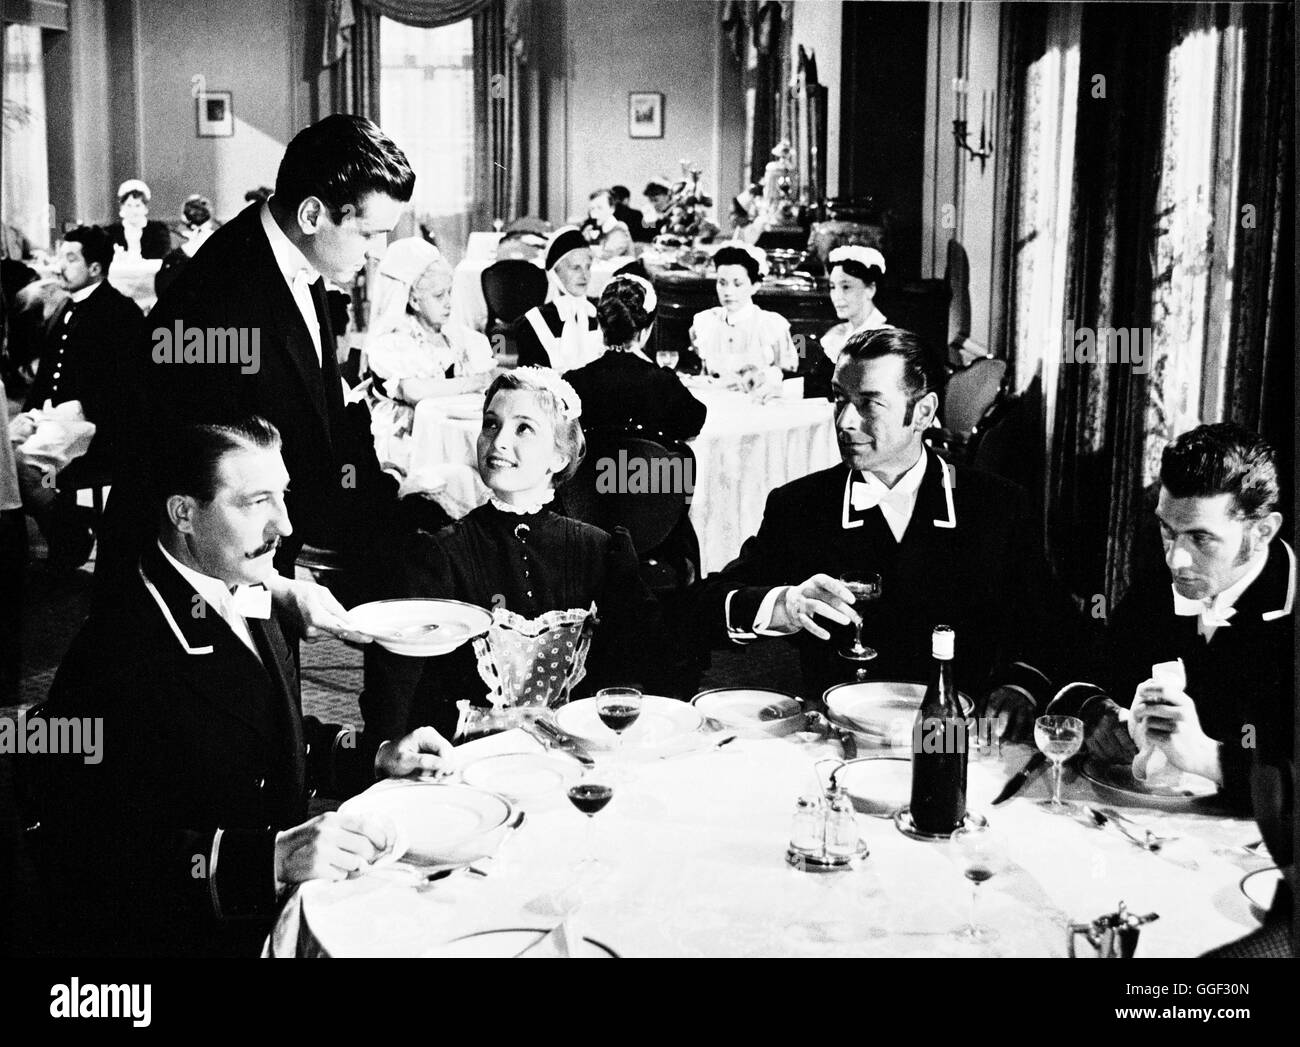 Hotel Adlon 1955